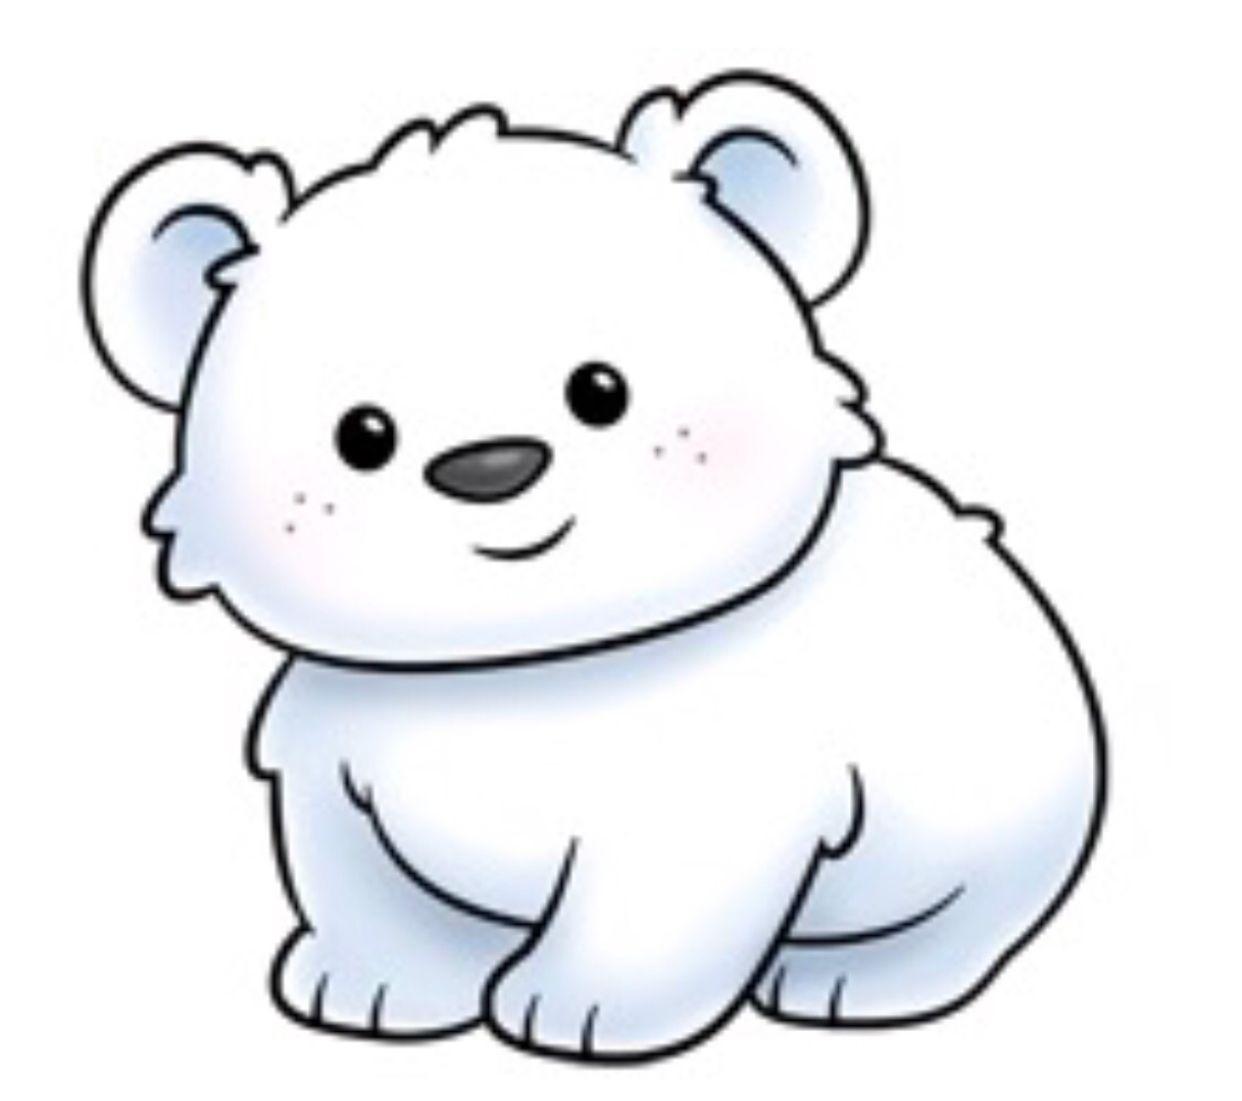 Polar Bear Dibujos De Animales Dibujos De Animales Tiernos